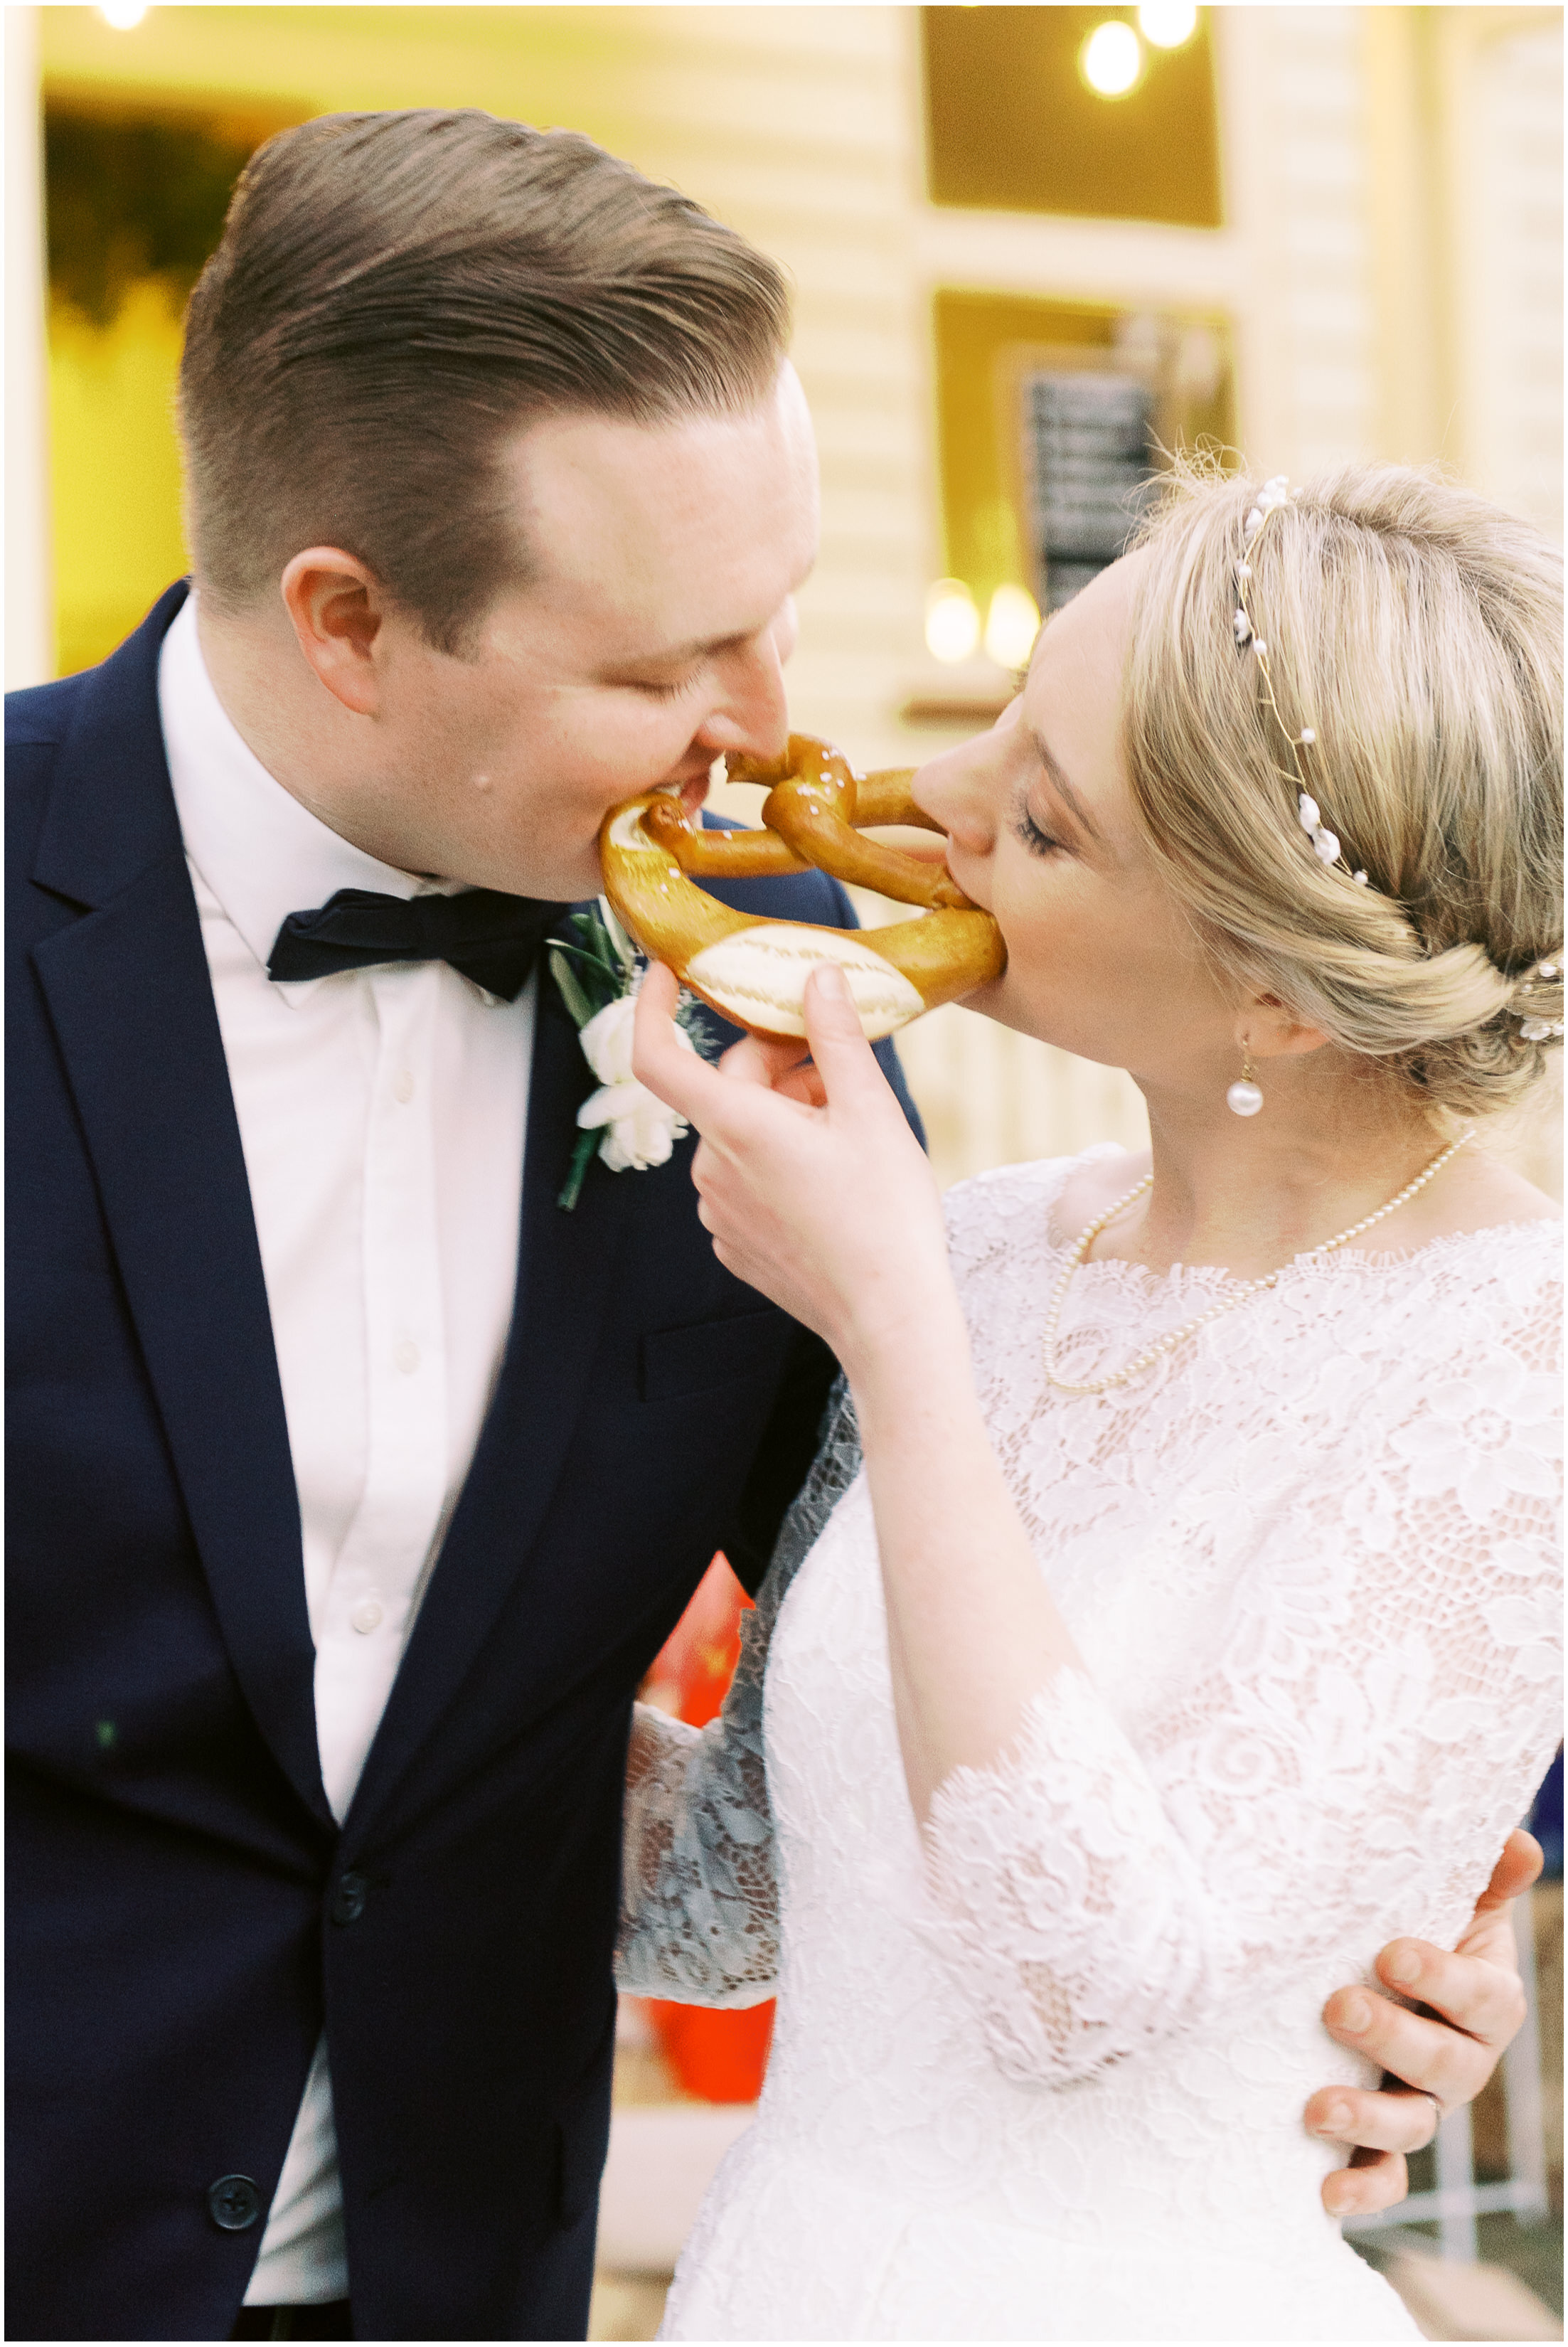 brisbane-fine-art-wedding-photographer-lauren-olivia-luxury-wedding-australia-39.jpg